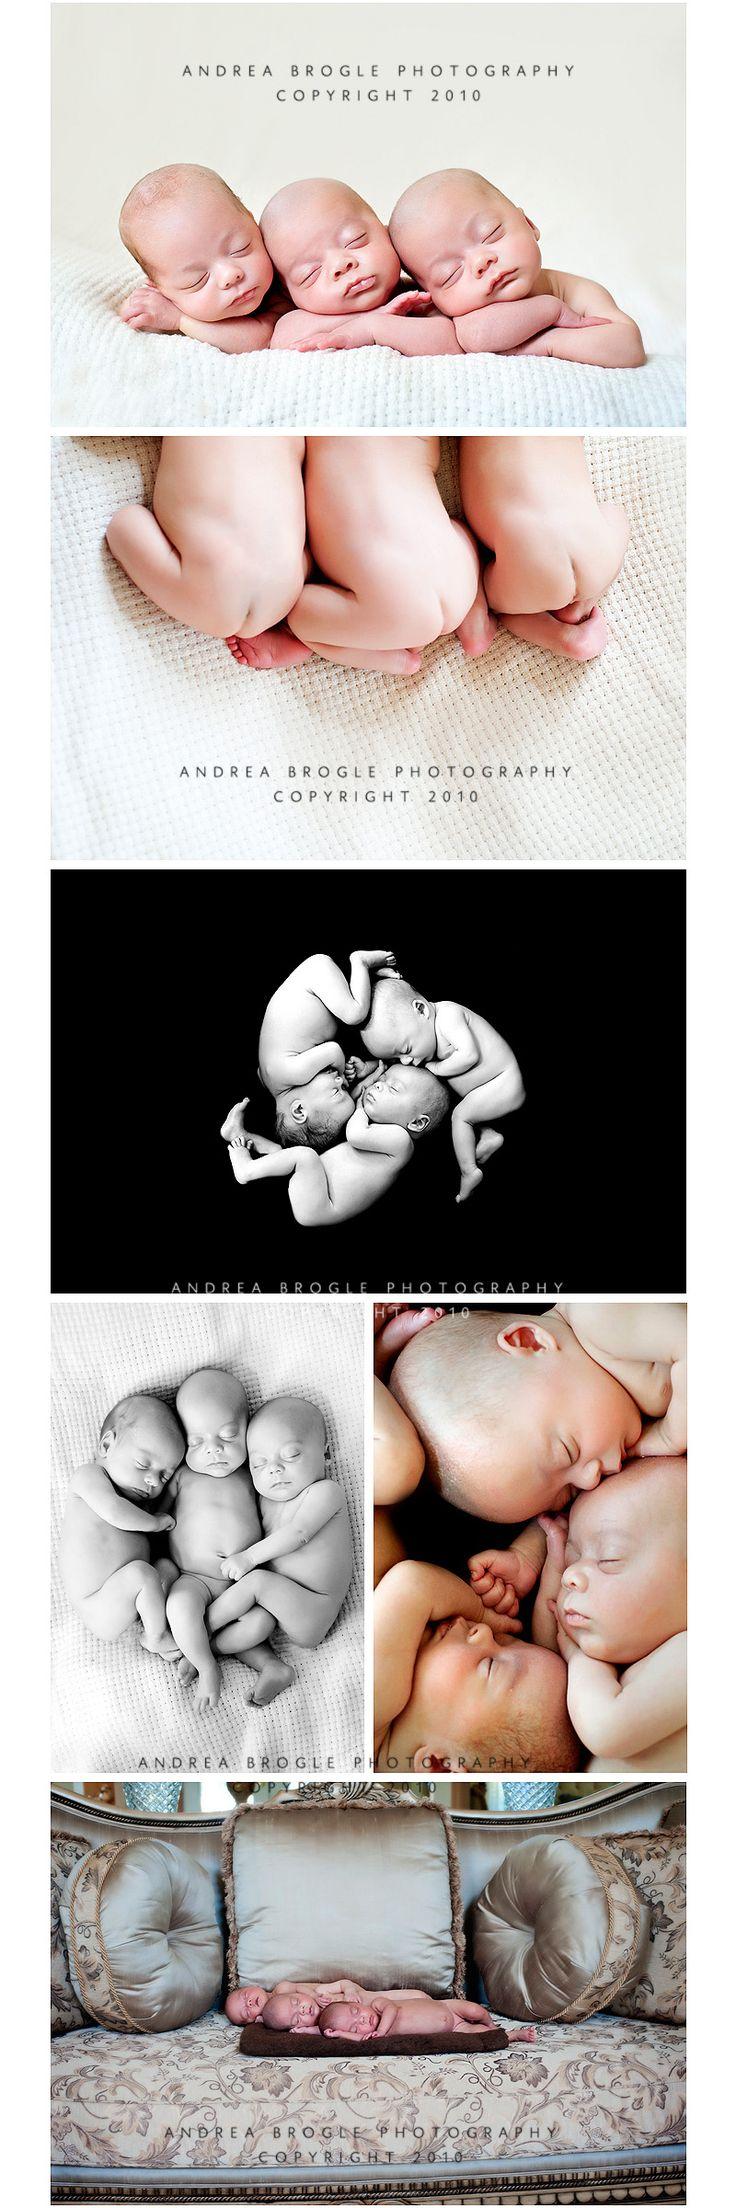 triplets series: Newborn Photography, Photo Ideas, Triplet Photos, Triplet Newborns, Baby Child Photography, Newborn Triplets, Baby Photos, Triplet Stuff